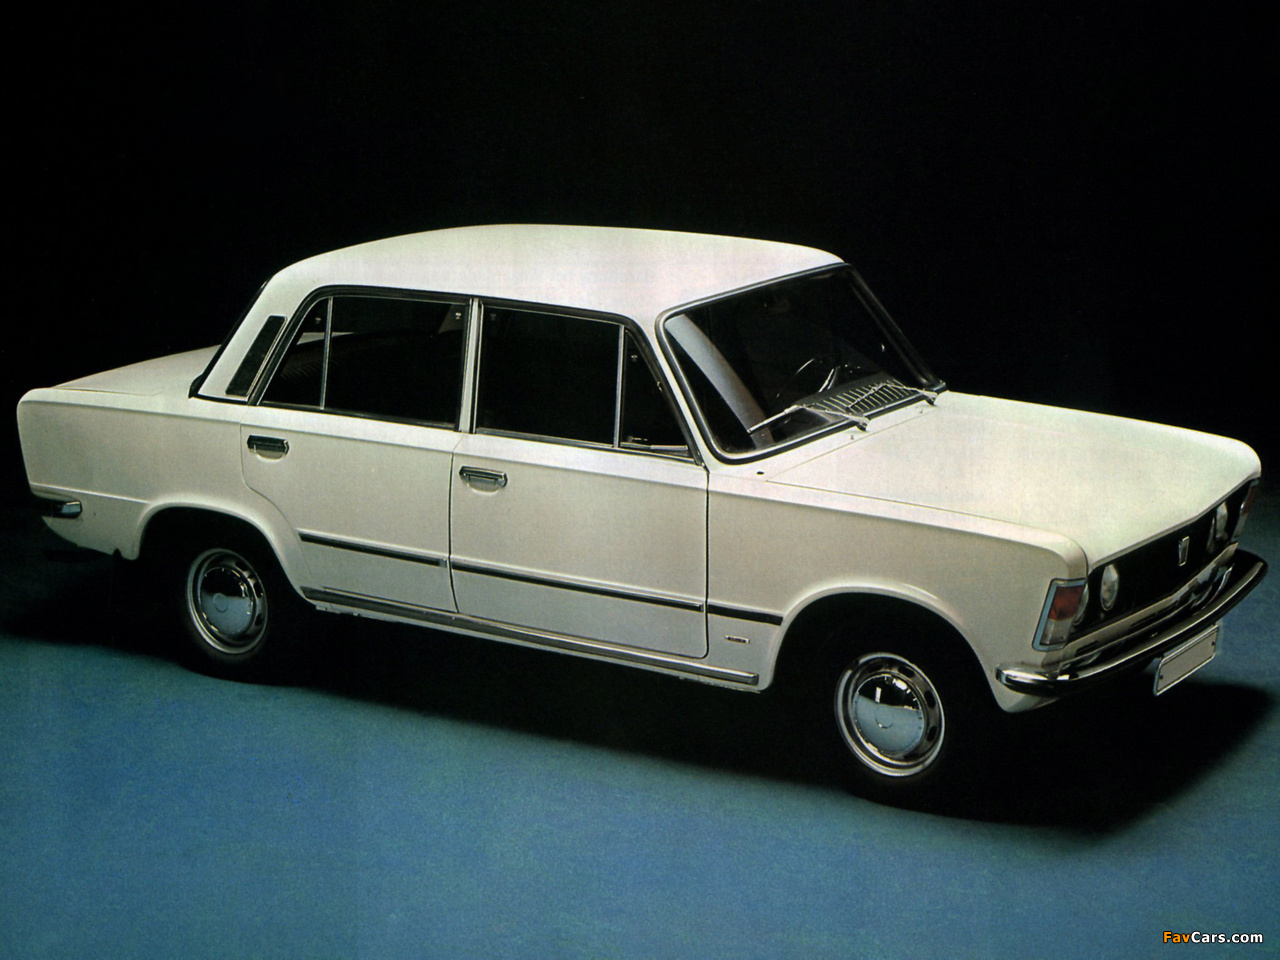 Photos Of Polski Fiat 125p 1967 82 1280x960